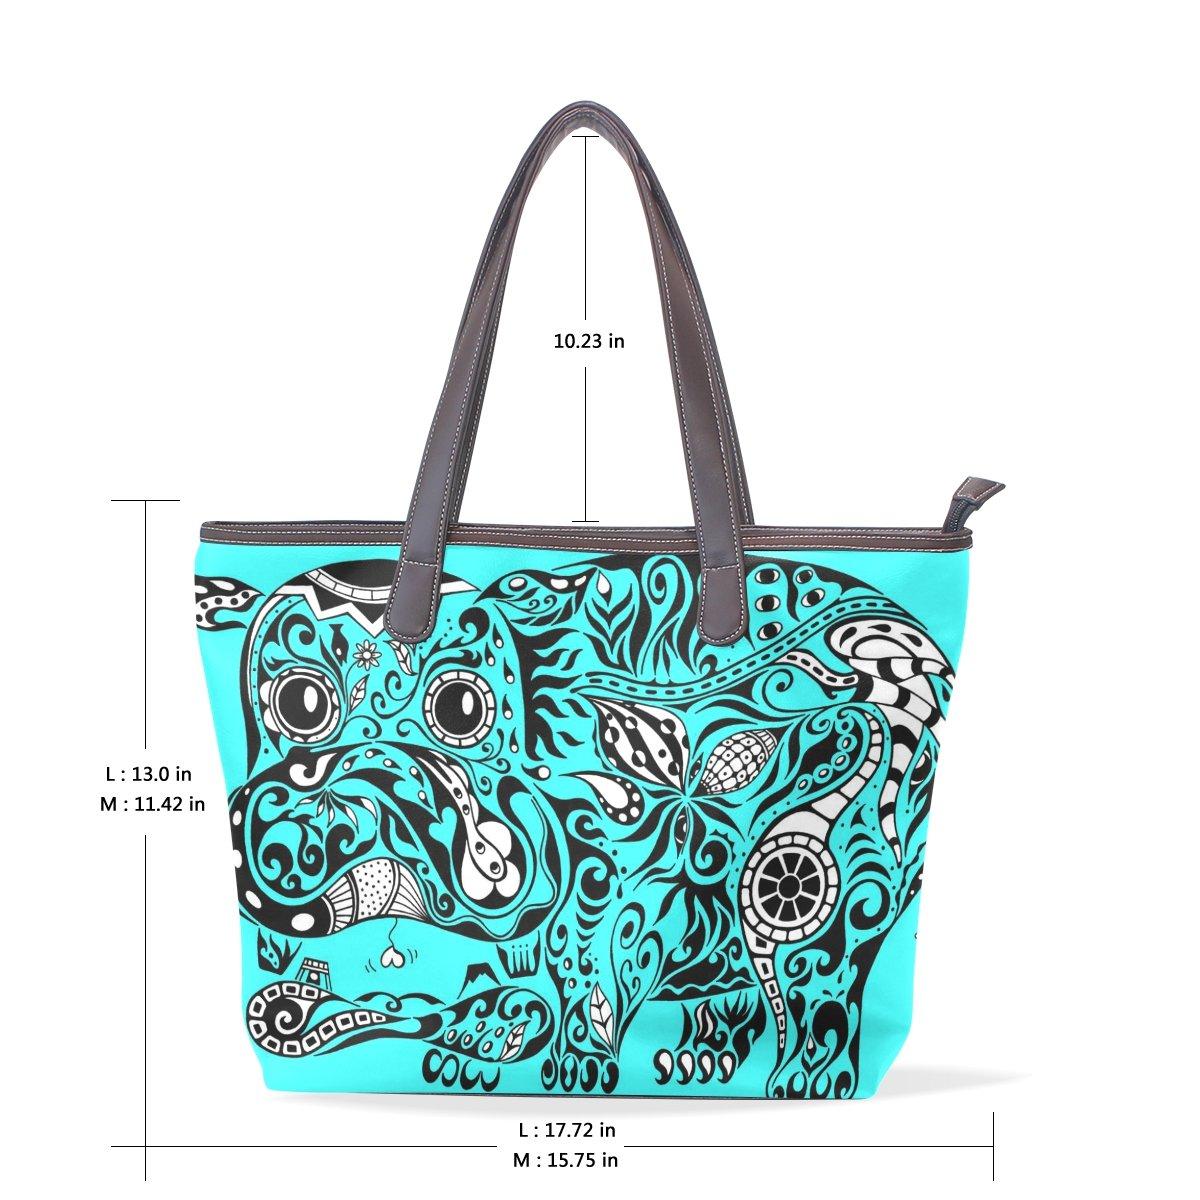 Ye Store Hippopotamus Lady PU Leather Handbag Tote Bag Shoulder Bag Shopping Bag